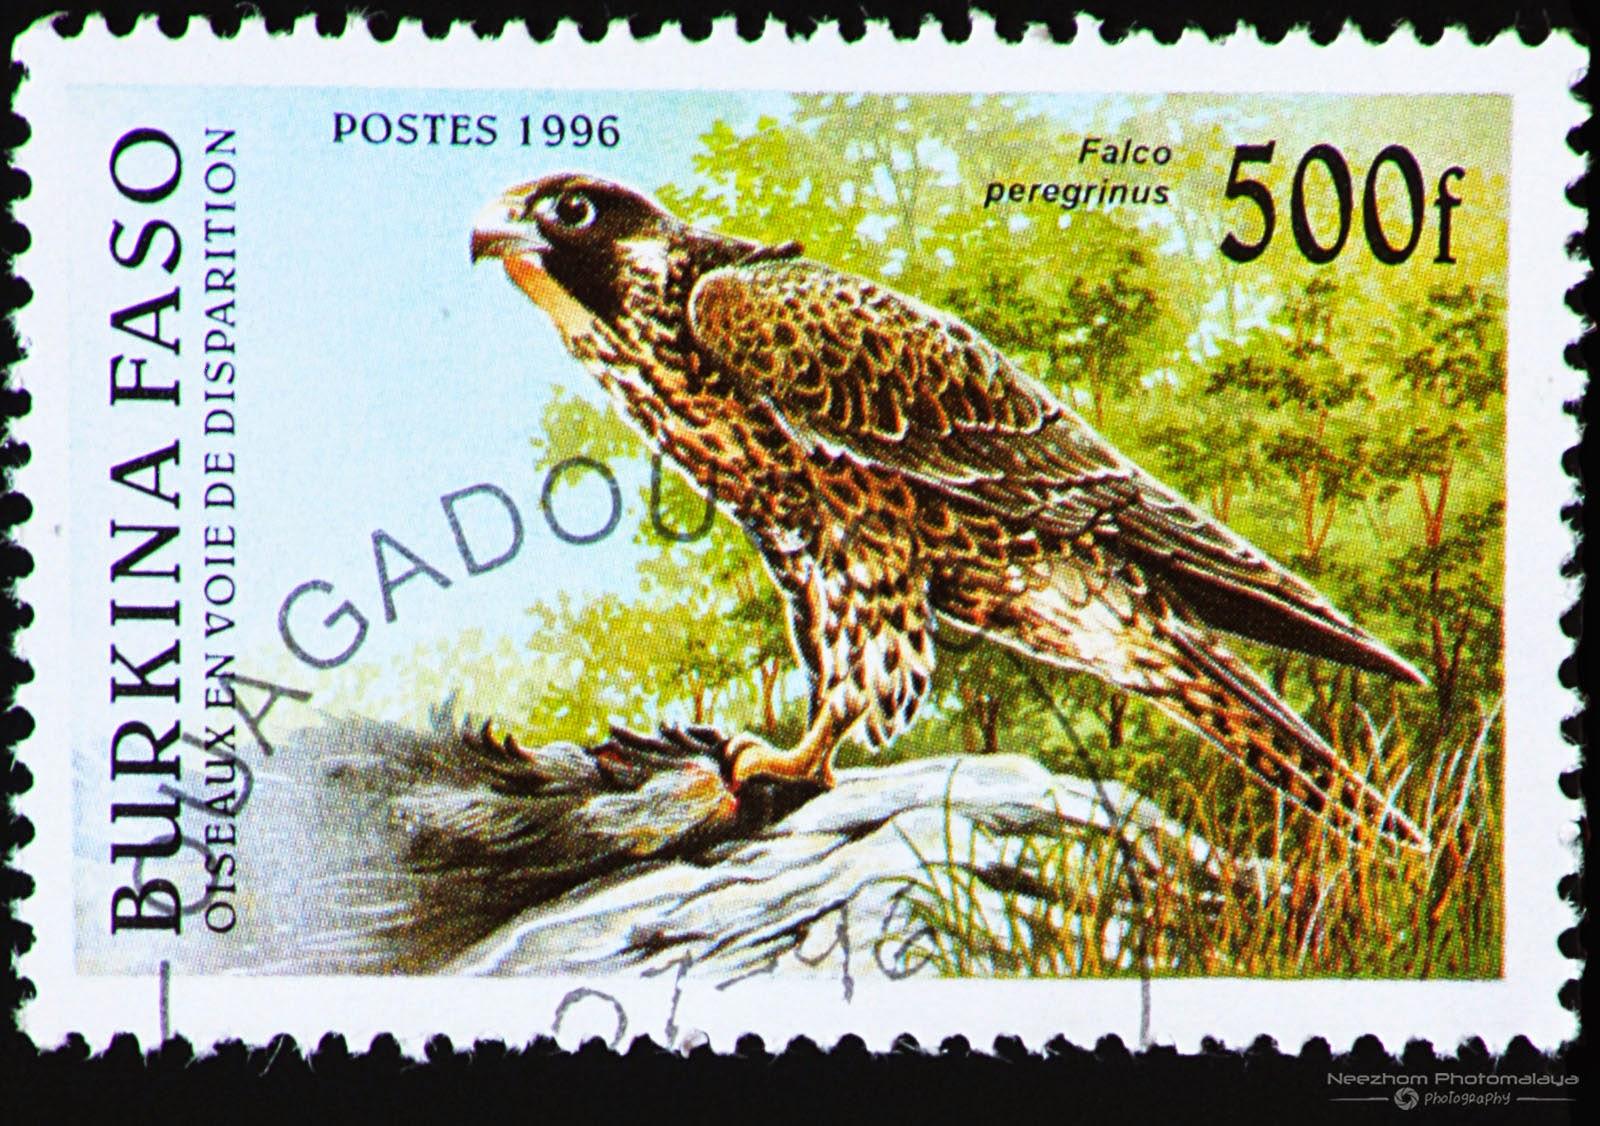 Burkina Faso 1996 Endangered Birds stamp - Peregrine falcon (Falco peregrinus) 500 f